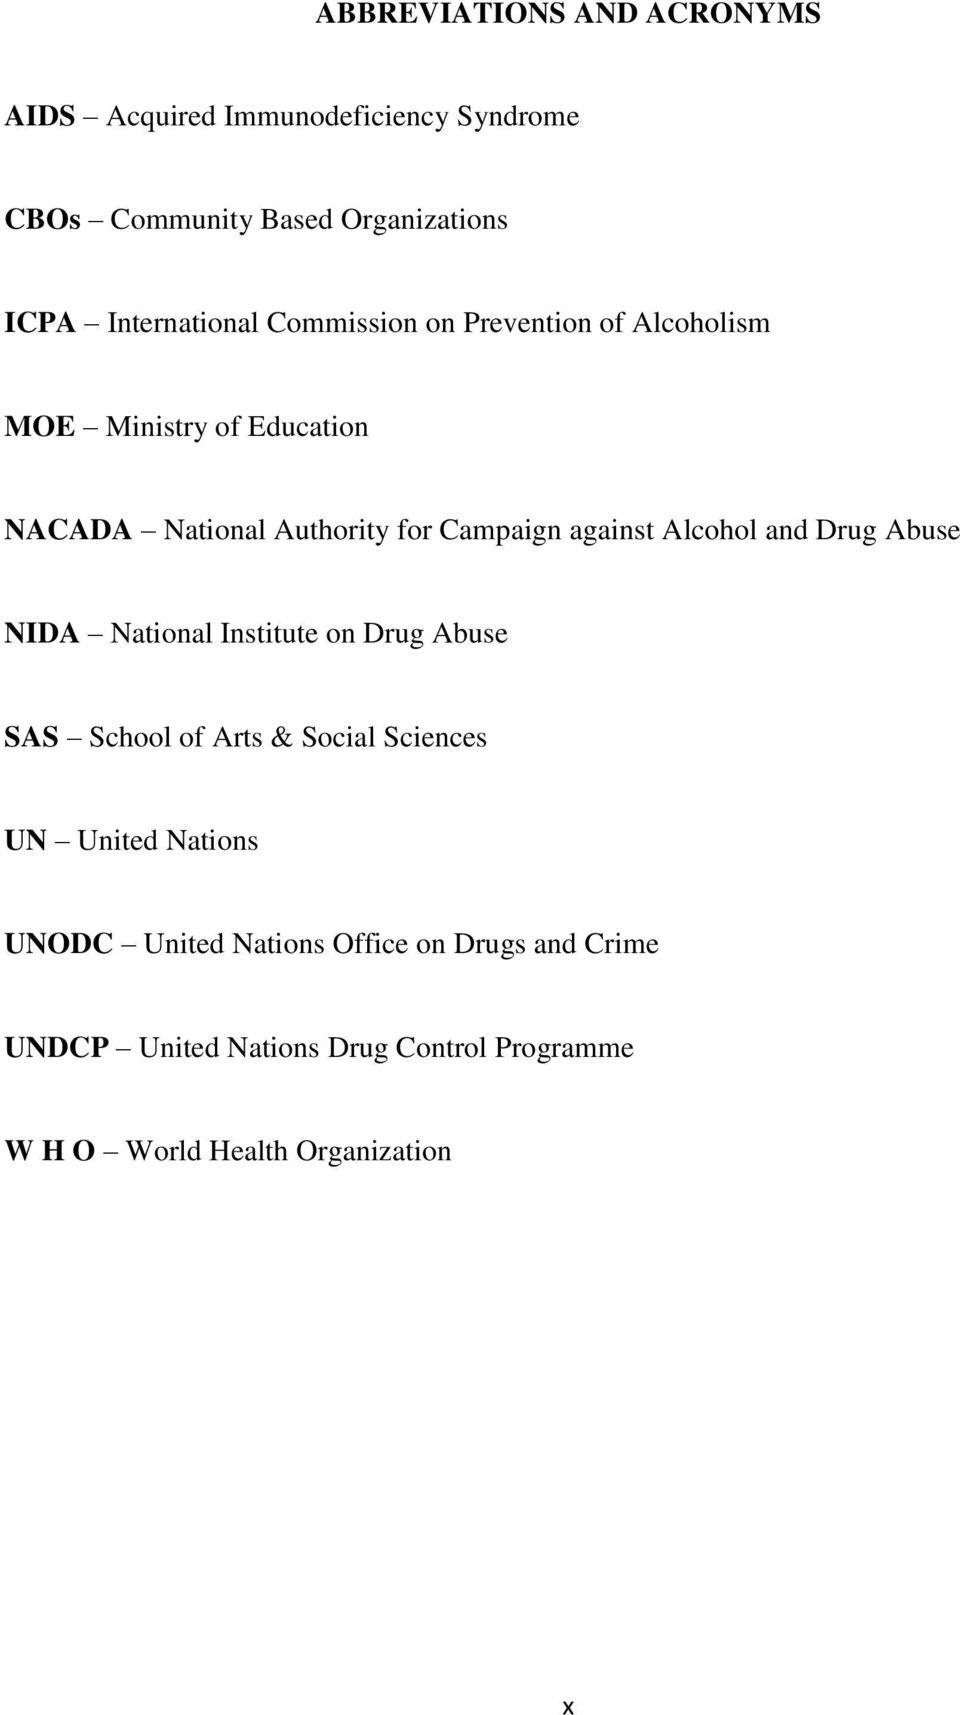 Essay On Drug Abuse Influence Of Drug Abuse On Students Academic